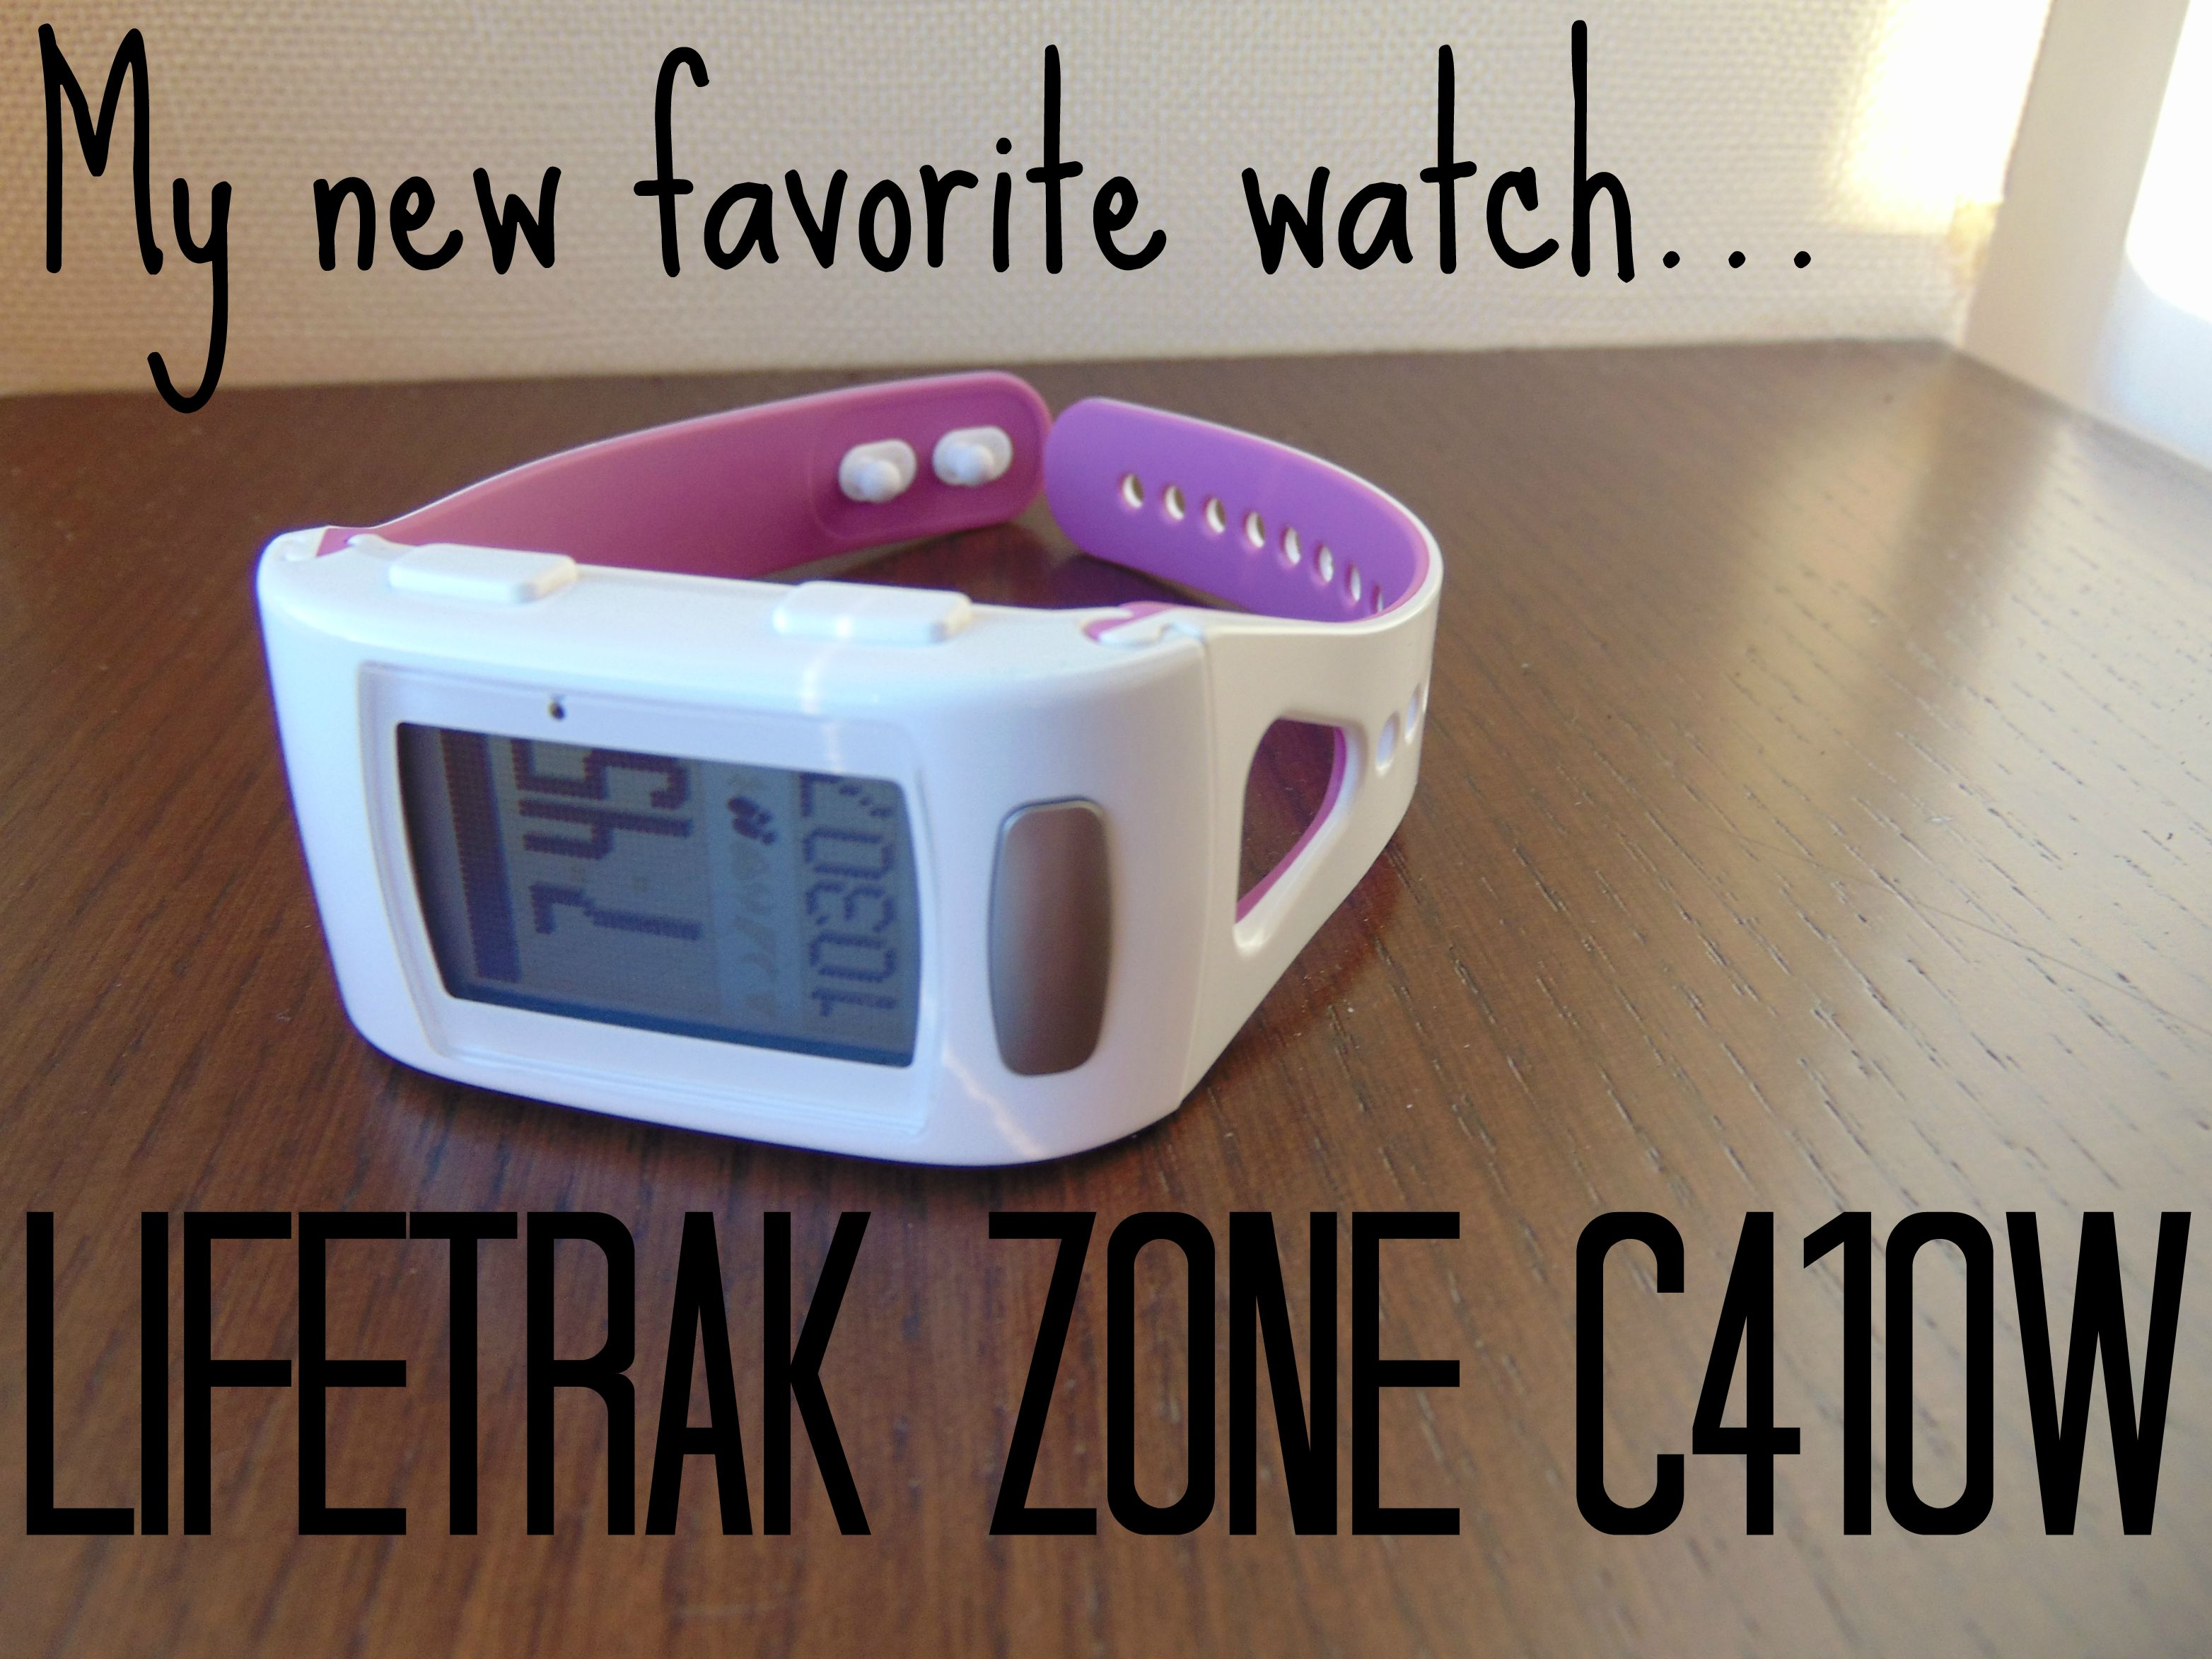 My favorite Heart Rart Monitor: Lifetrak Zone C410W